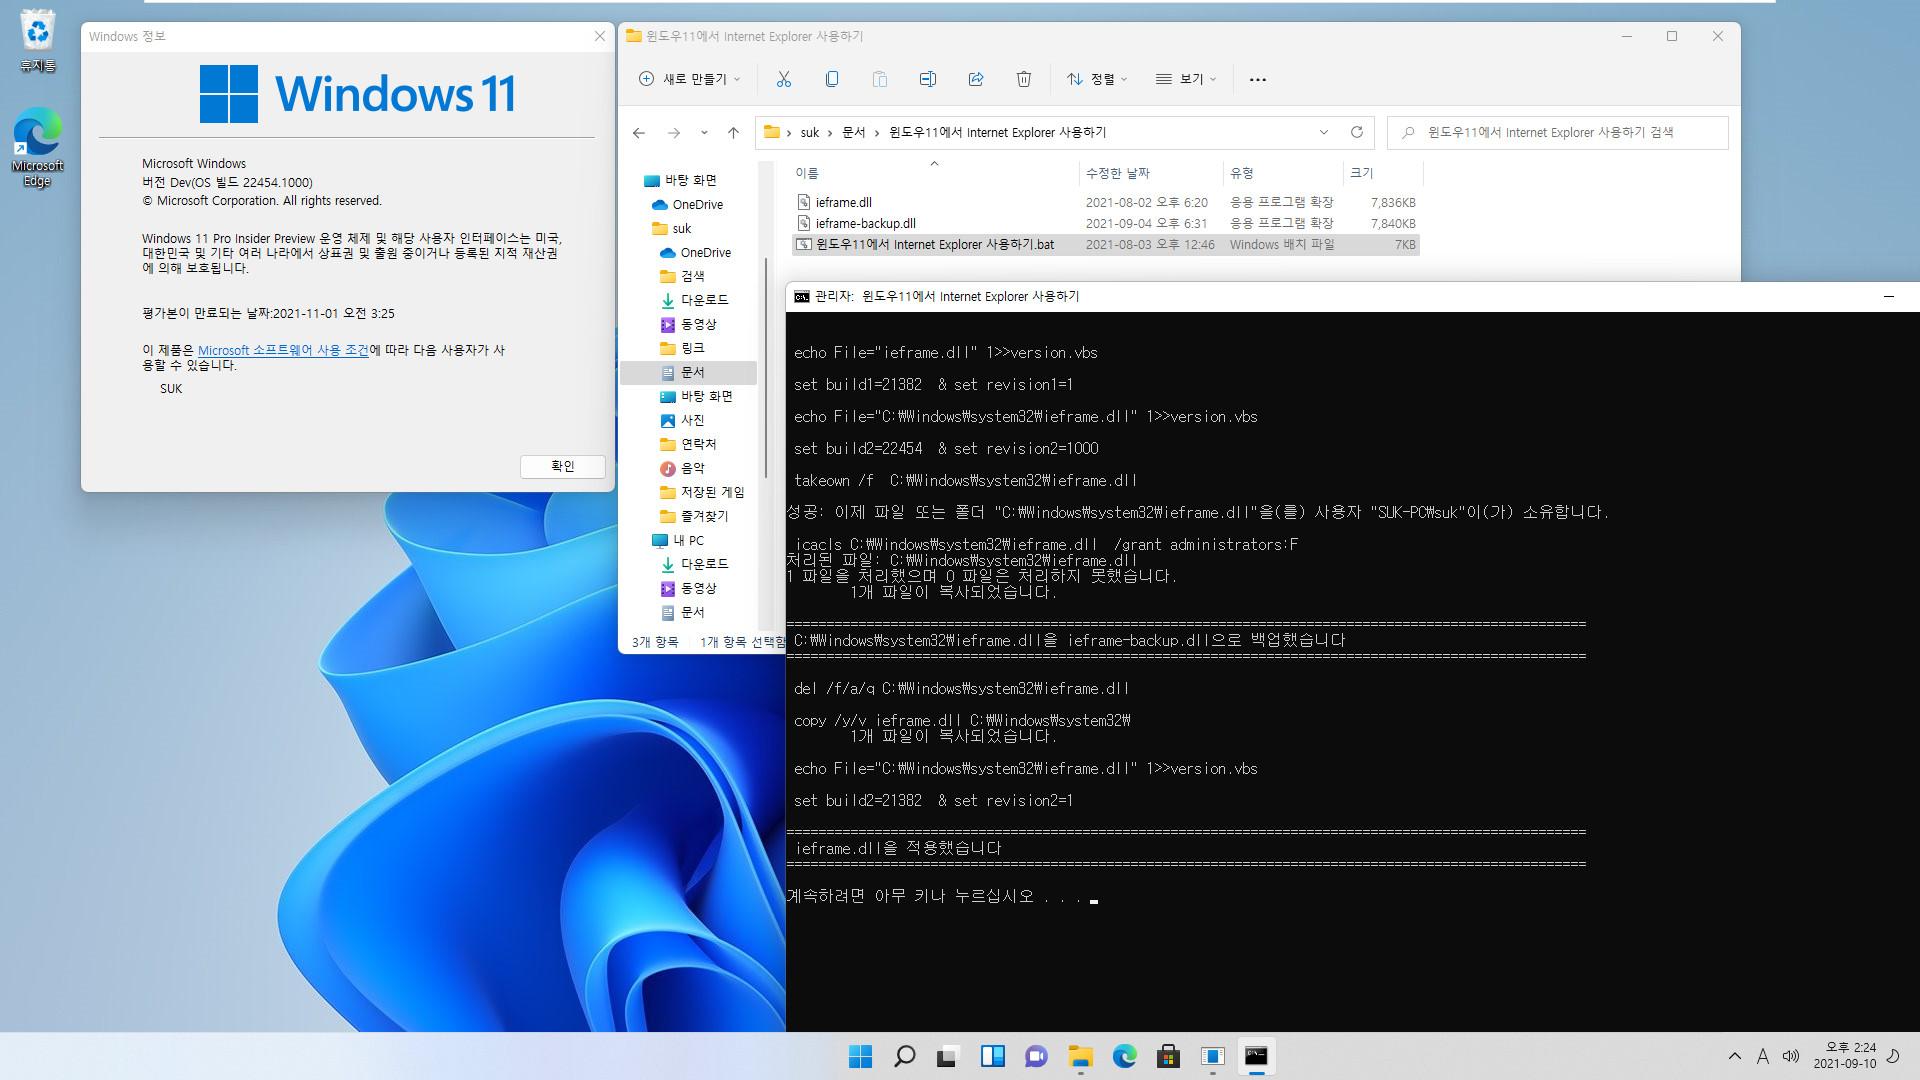 Windows 11 인사이더 프리뷰 - 버전 Dev (OS 빌드 22454.1000) 나왔네요 - 개발자 채널 - IE 살리는 방법은 지난 22449 빌드처럼 여전히 되지 않습니다. 이번에는 원상 복구는 되네요 2021-09-10_142441.jpg